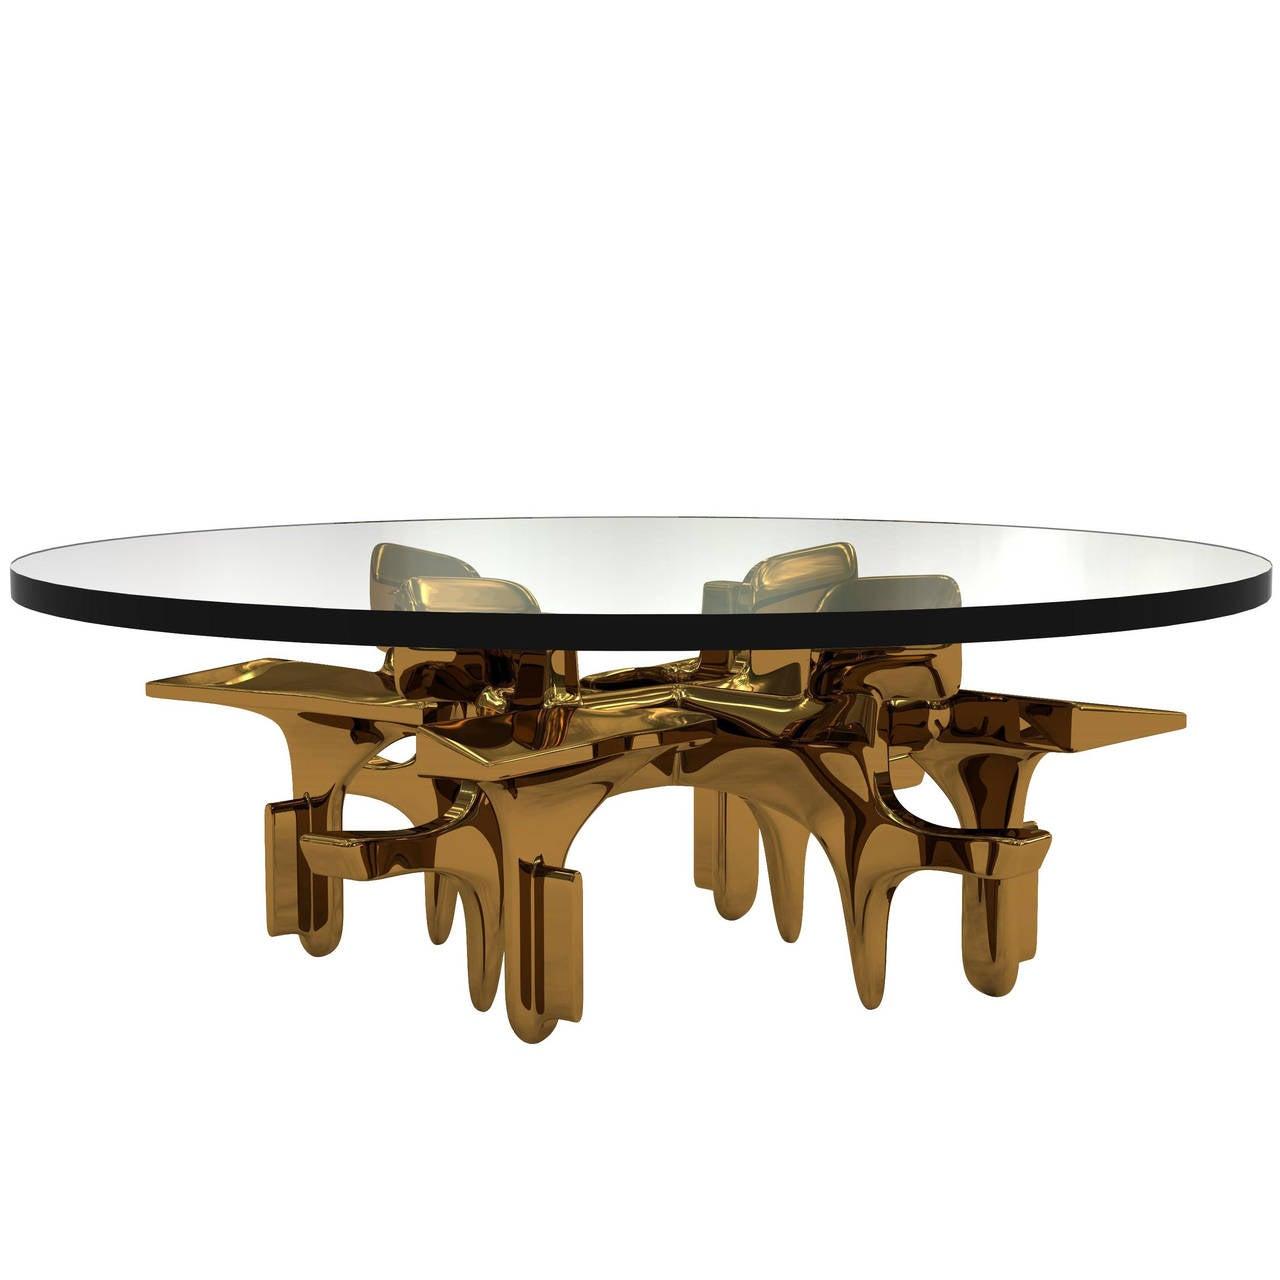 Lift Top Coffee Table Art Van: Roen Coffee Table By Craig Van Den Brulle For Sale At 1stdibs